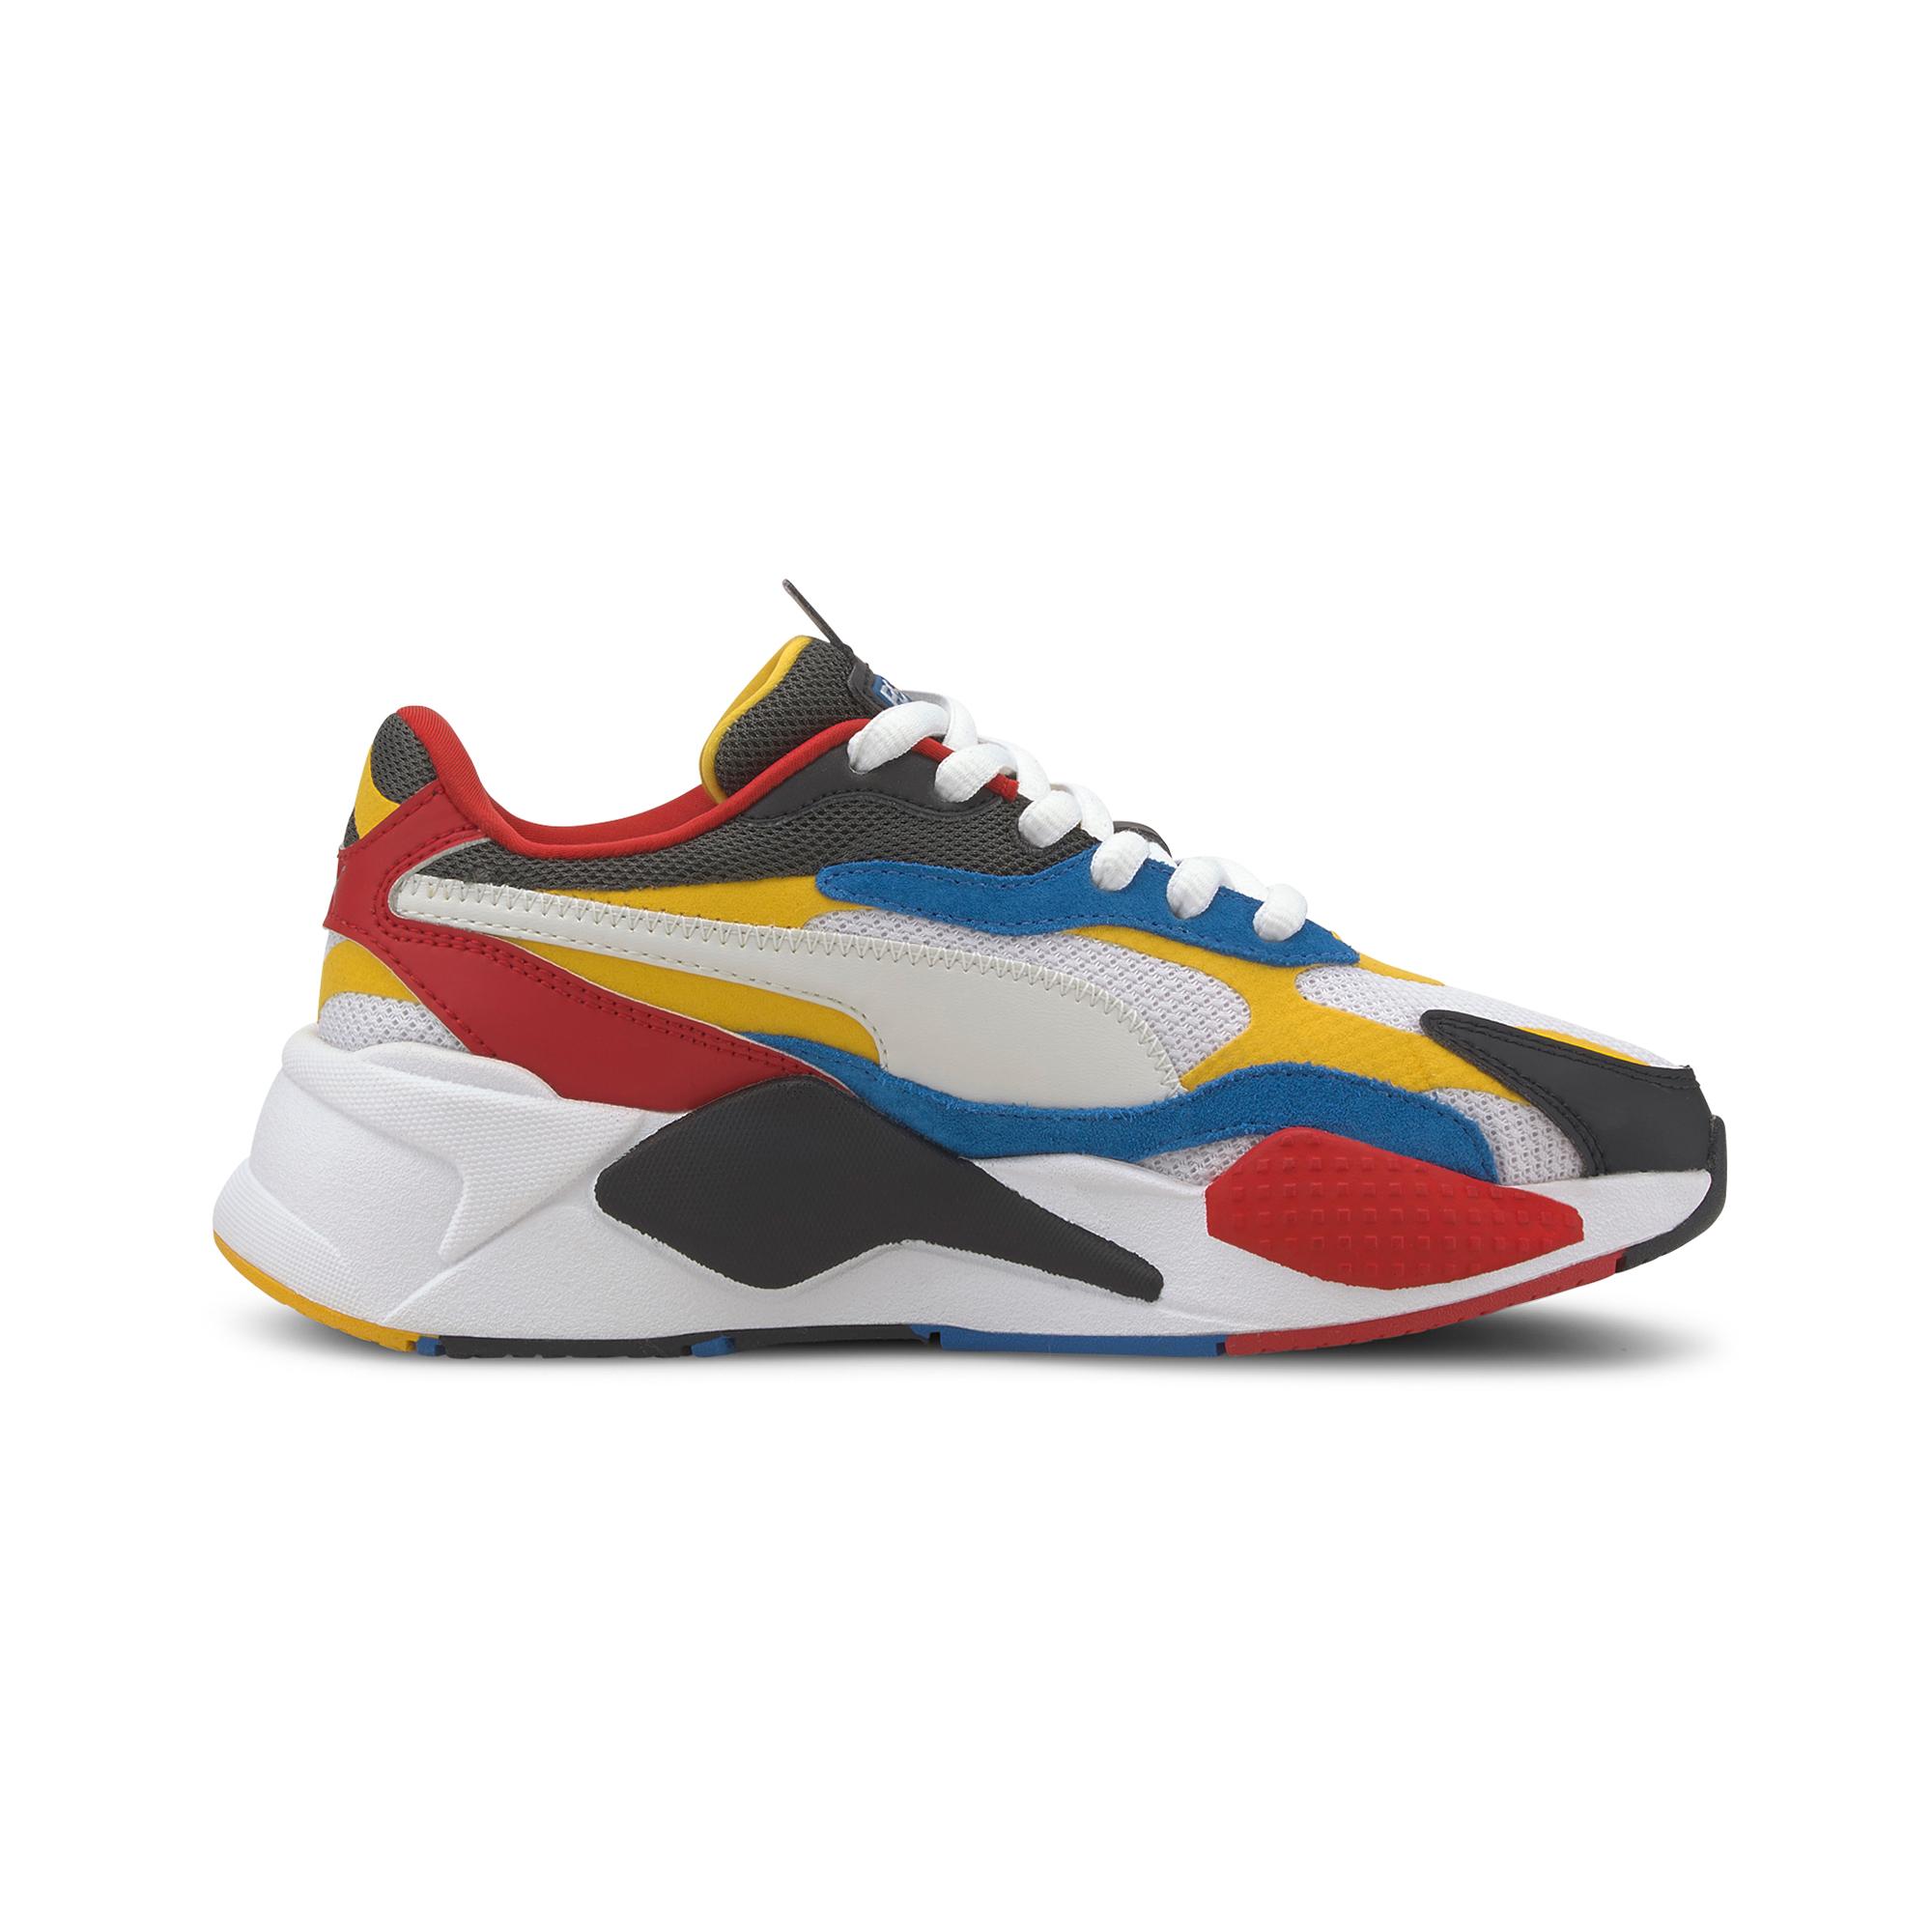 Puma RS-X³ Puzzle Kadın Renkli Spor Ayakkabı